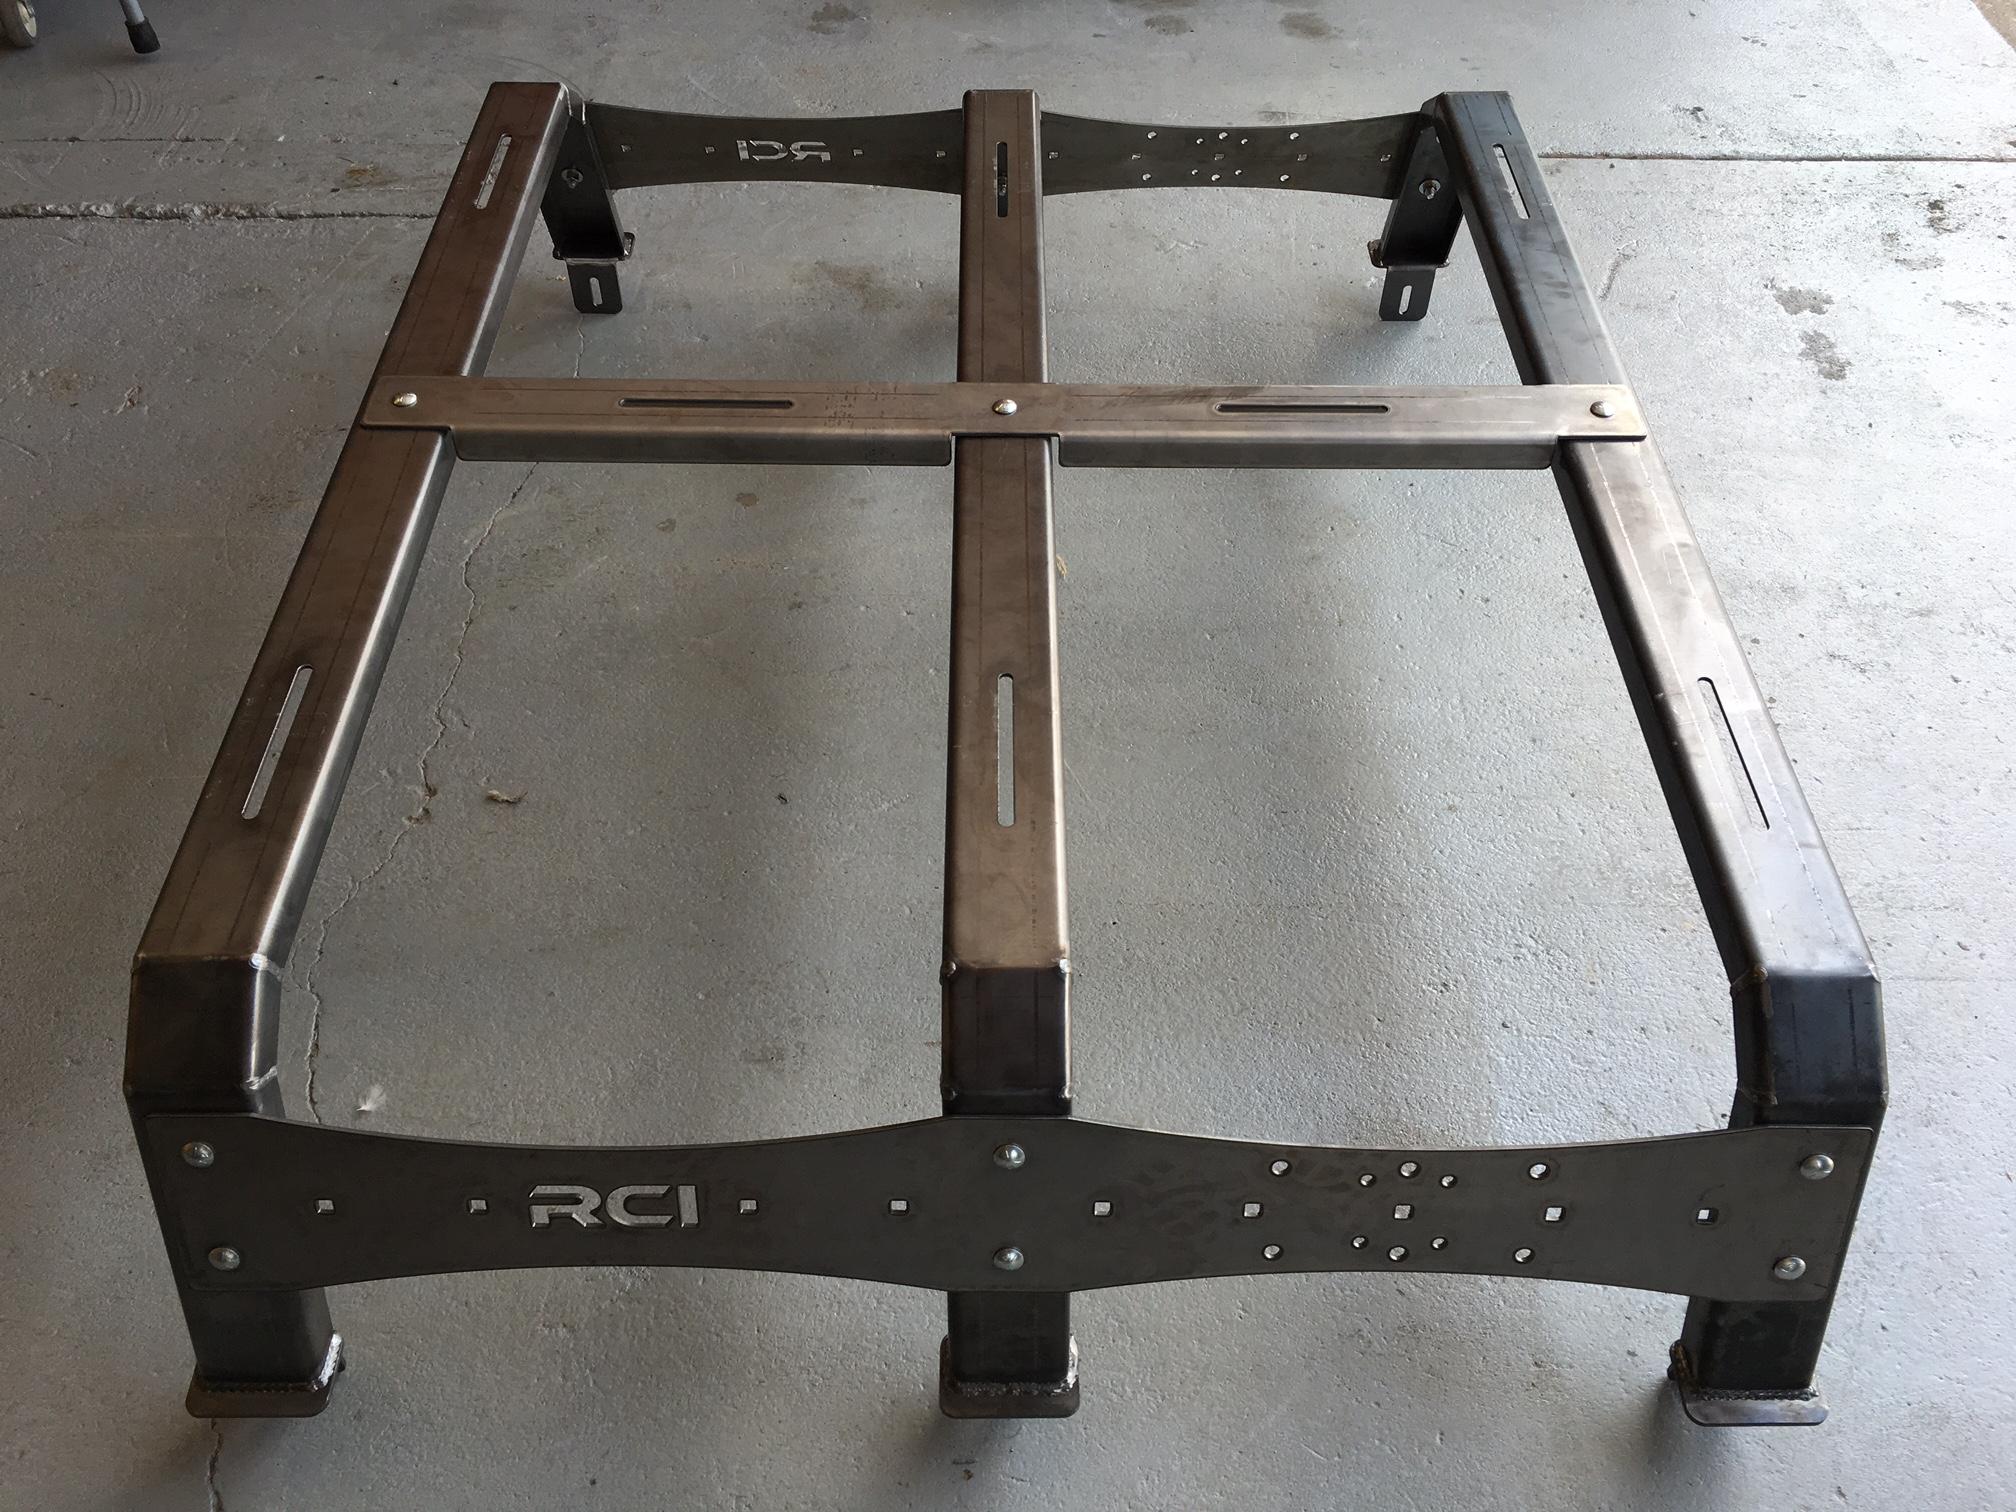 Rci 07 19 Tundra Bed Rack Unibedrack 12in 6ft 749 99